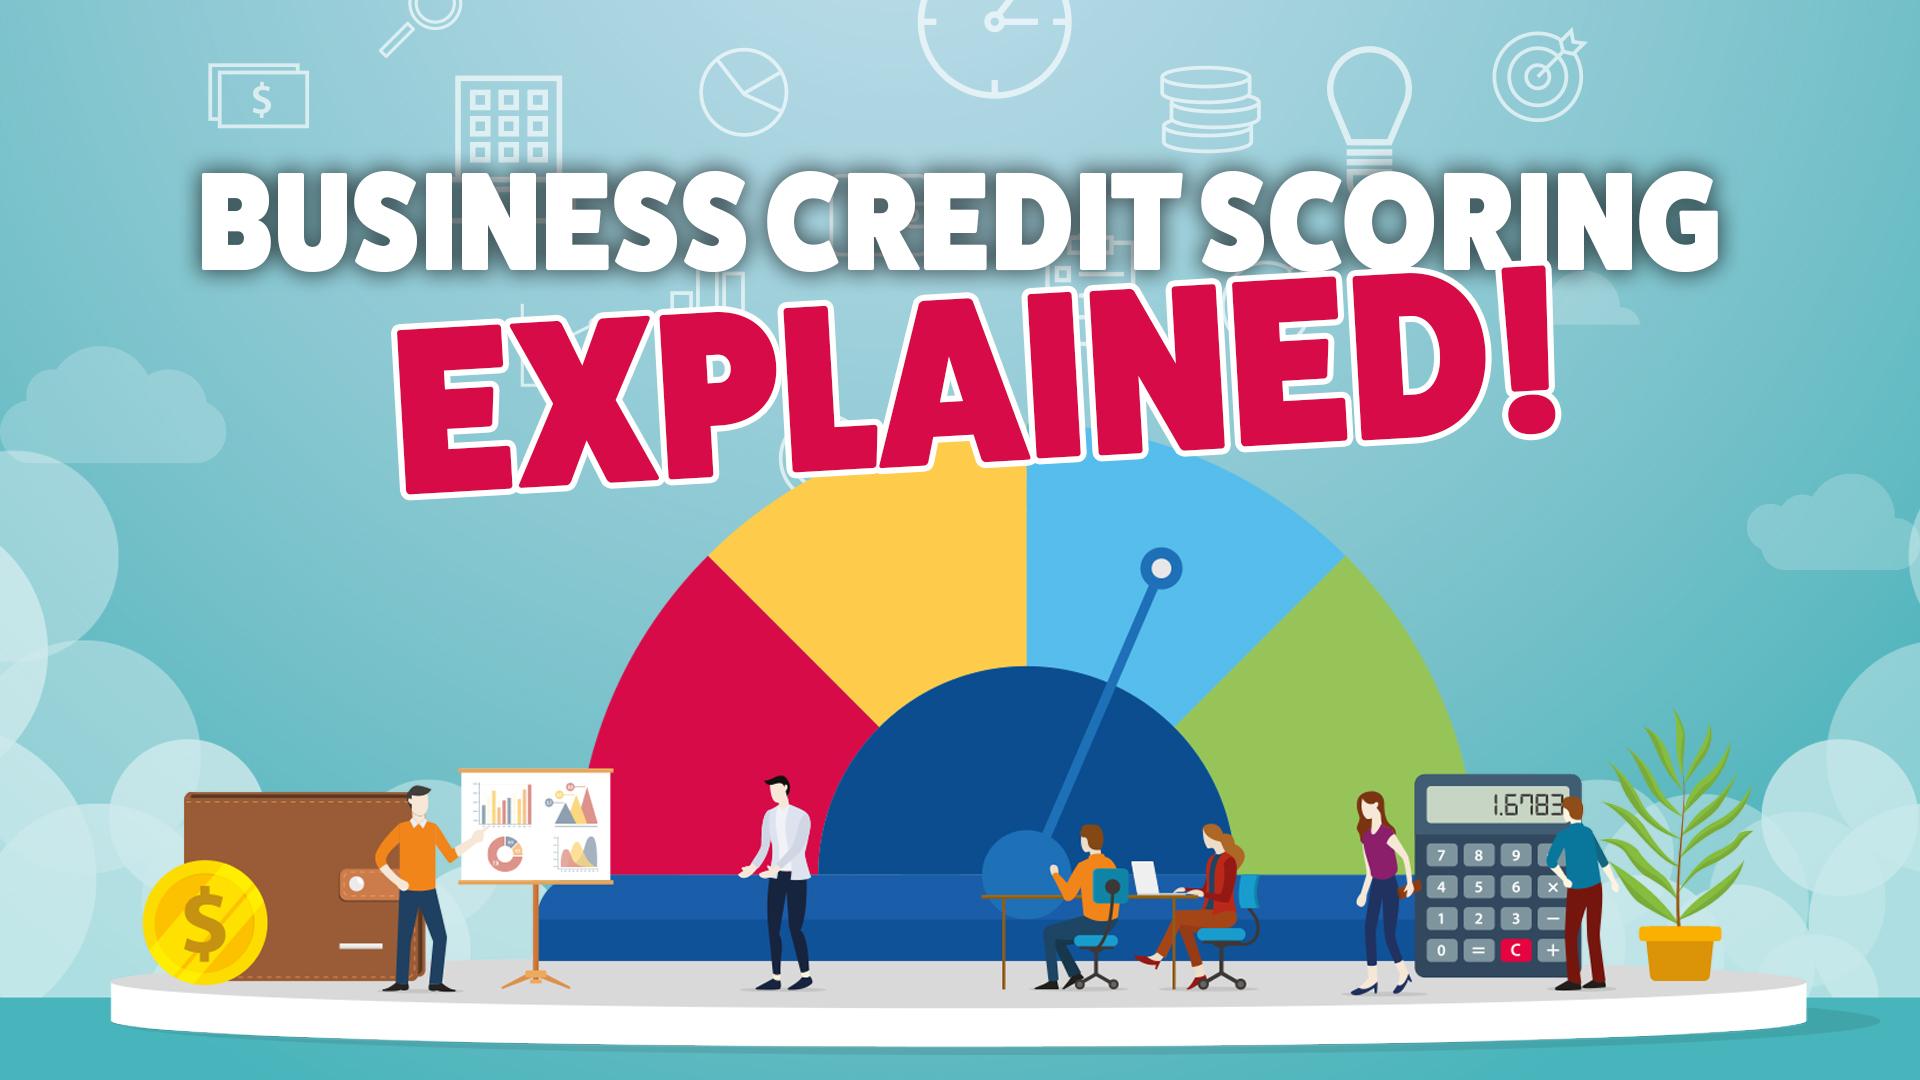 Business Credit Scoring Explained